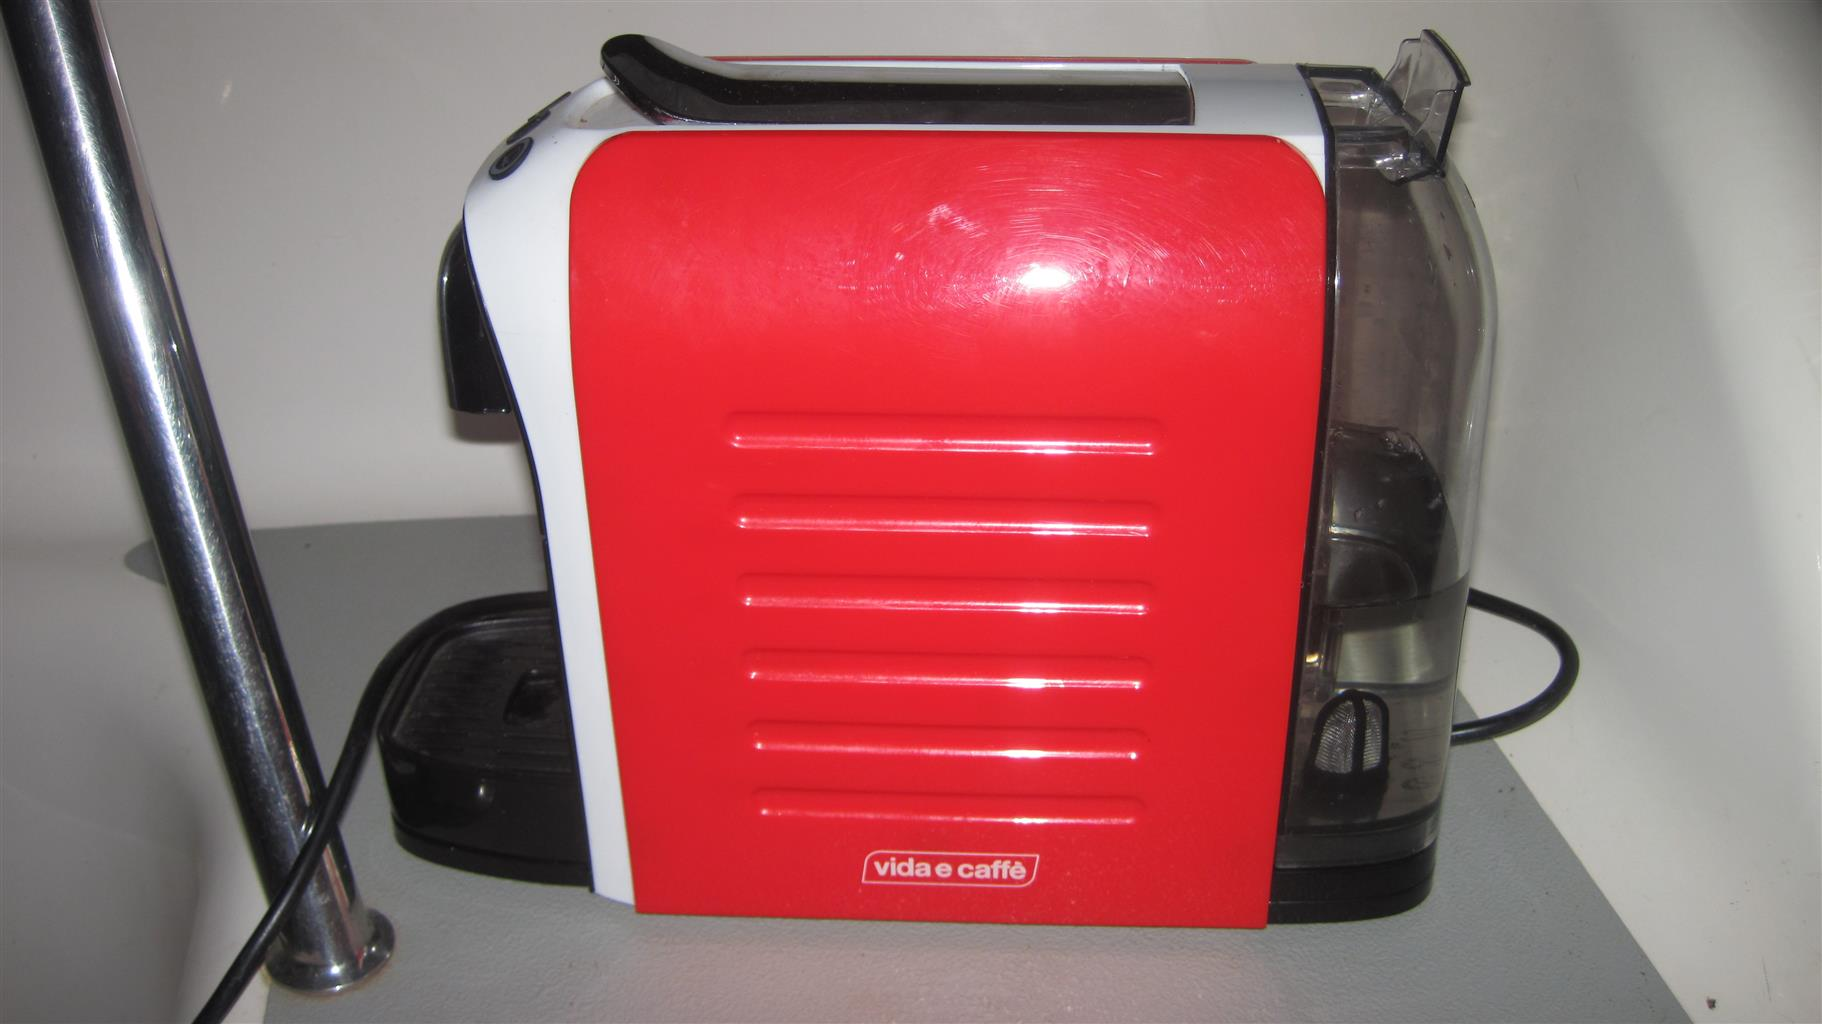 russelhobbs cofee maker